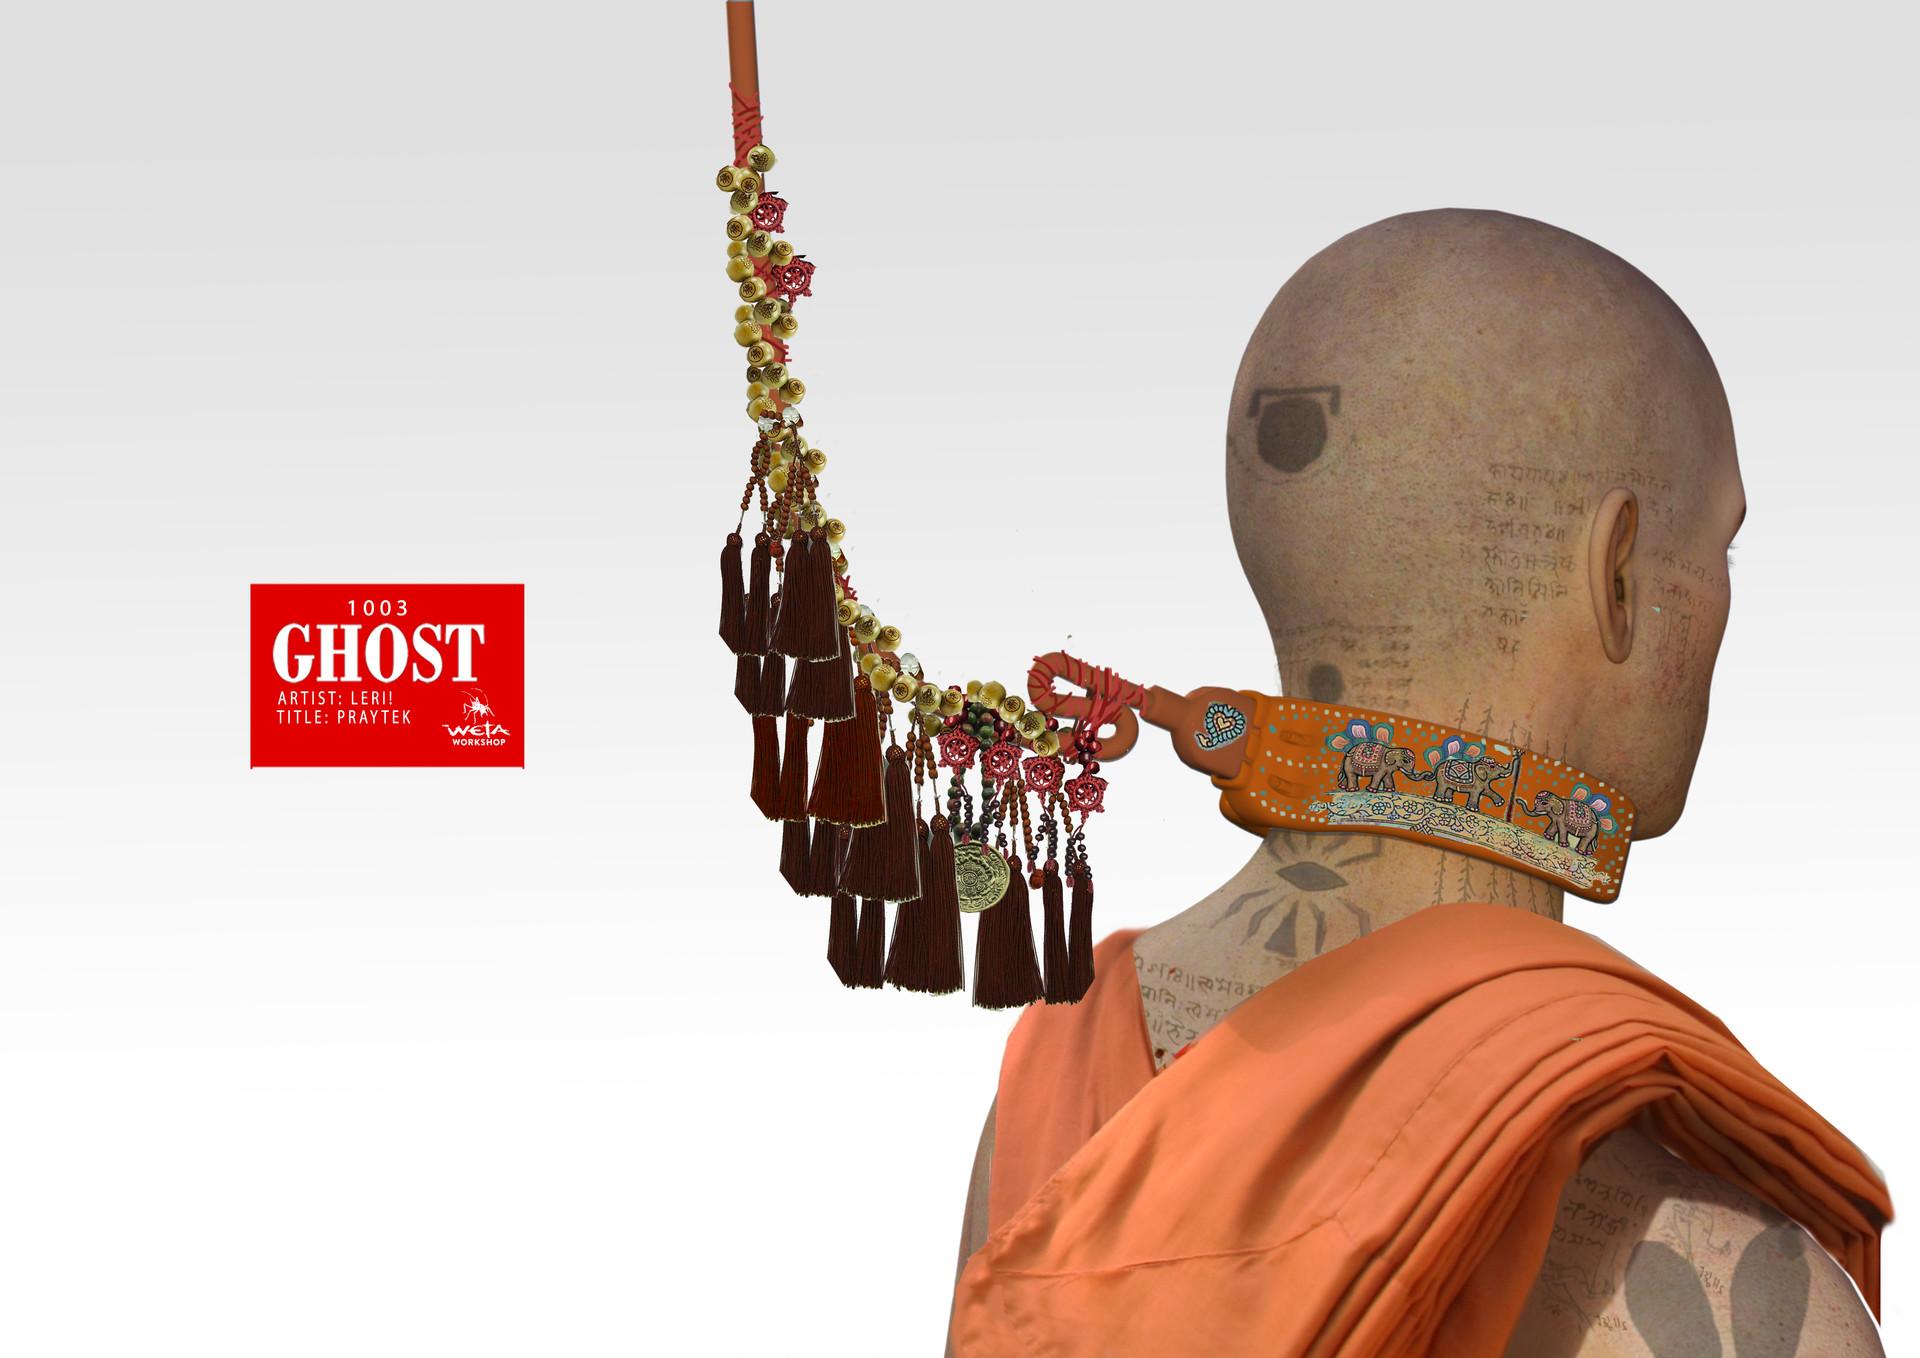 Weta workshop design studio 1003 monks neckjack 02 lg